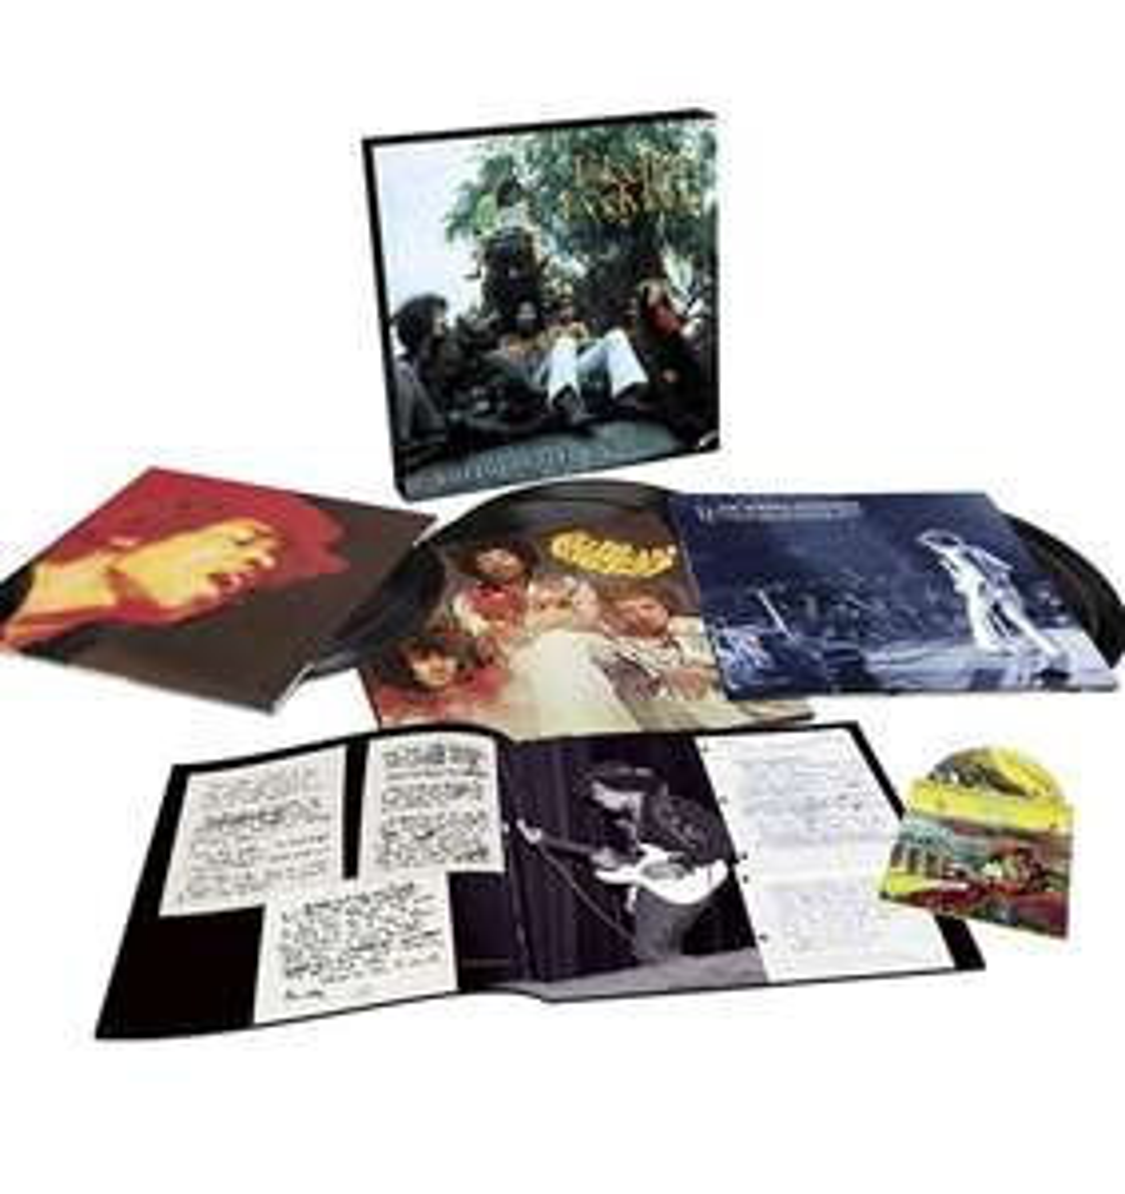 Jimi Hendrix Experience- Electric Ladyland 50th anniversary deluxe box set [vinyl] 67.51 Amazon